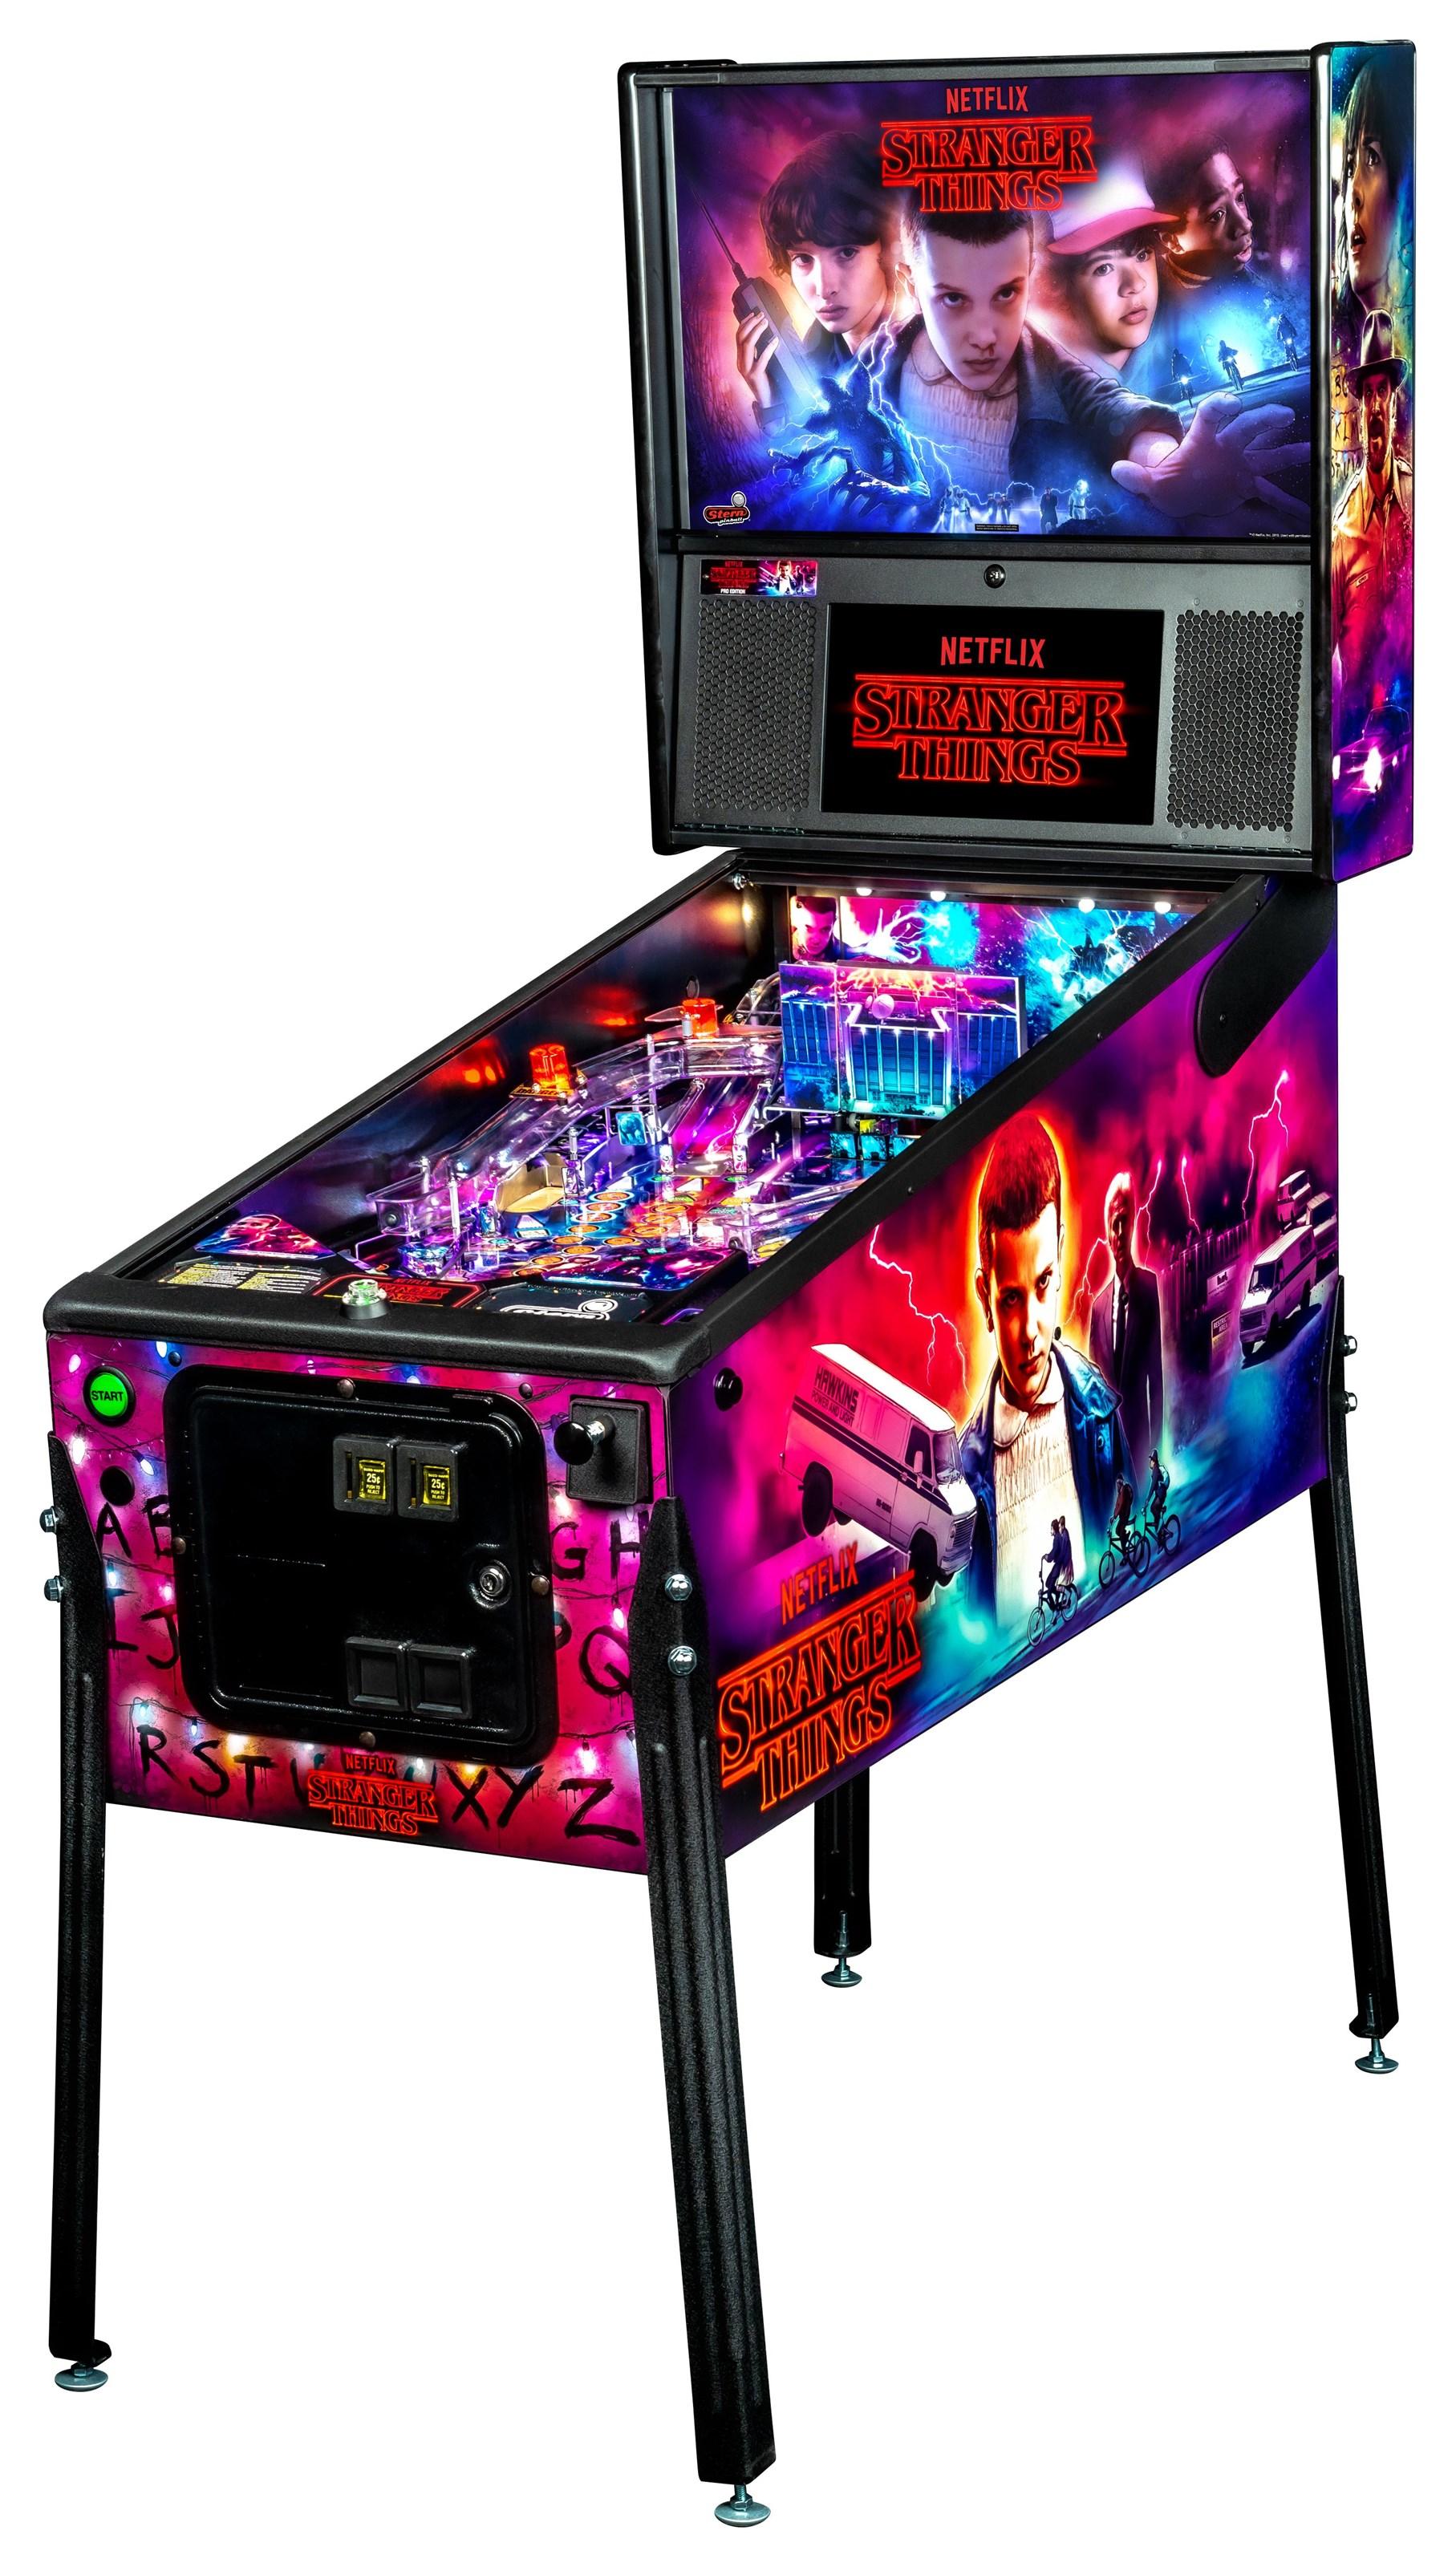 Games Stranger Things Pinball Machine by Stern Pinball at Johnny Janosik